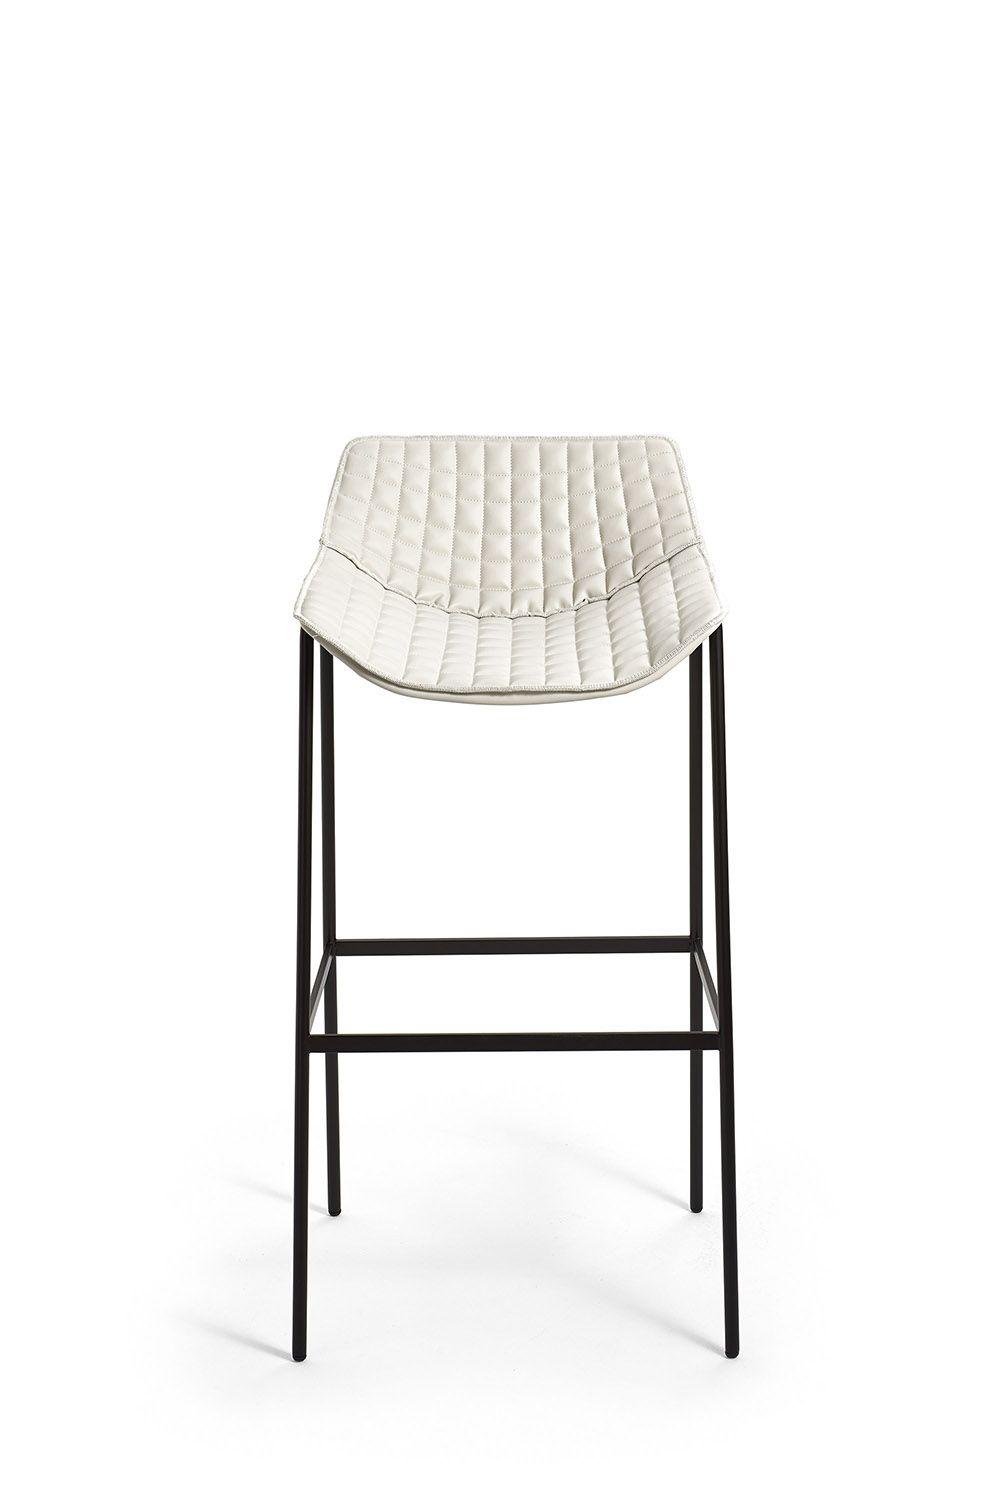 #Summerset #stools #ottomans #accessories #varaschin #design #furniture  #outdoordesign #outdoordecor